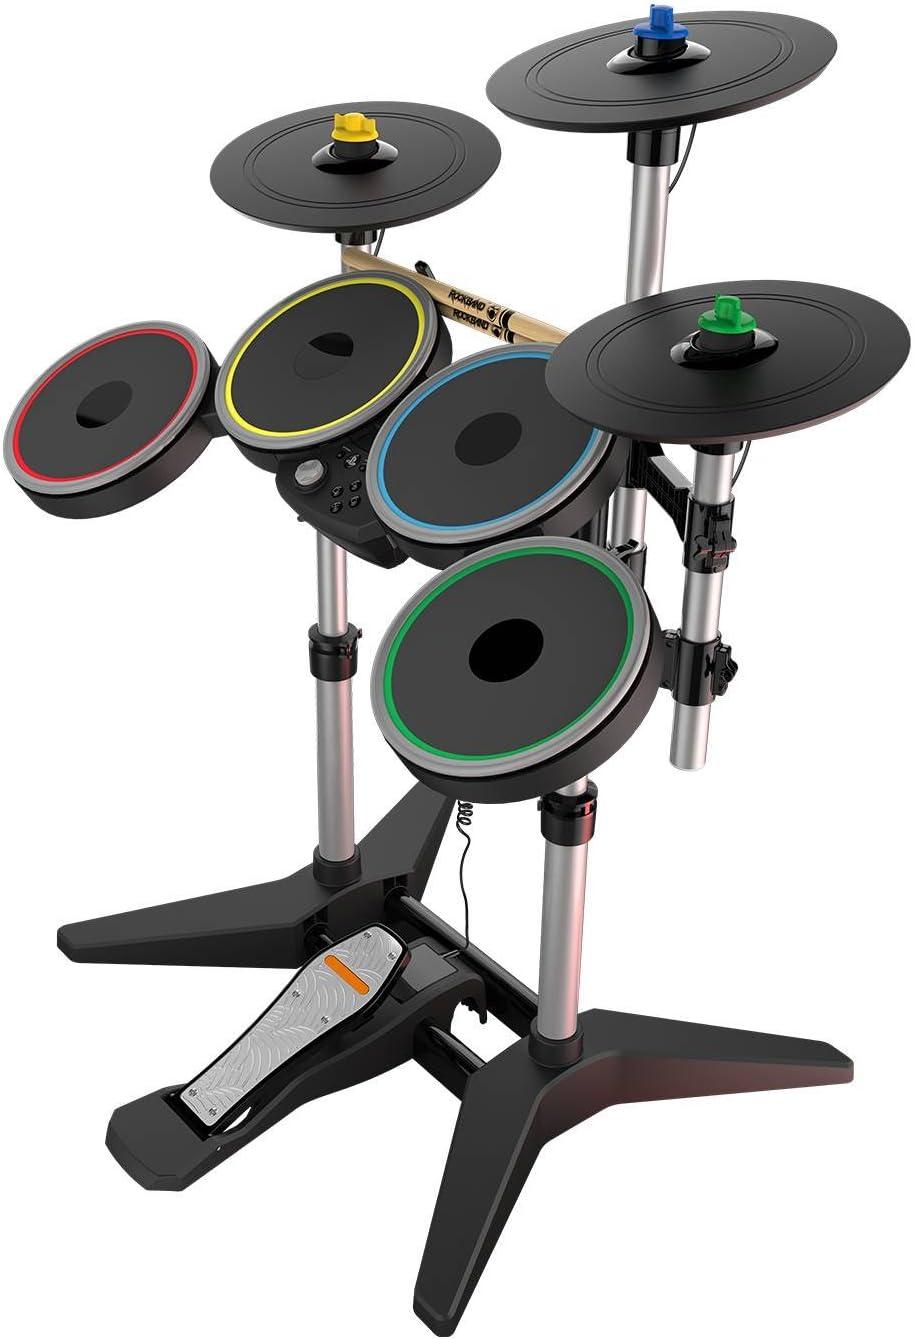 Amazon com: Rock Band 4 Wireless Pro-Drum Kit for